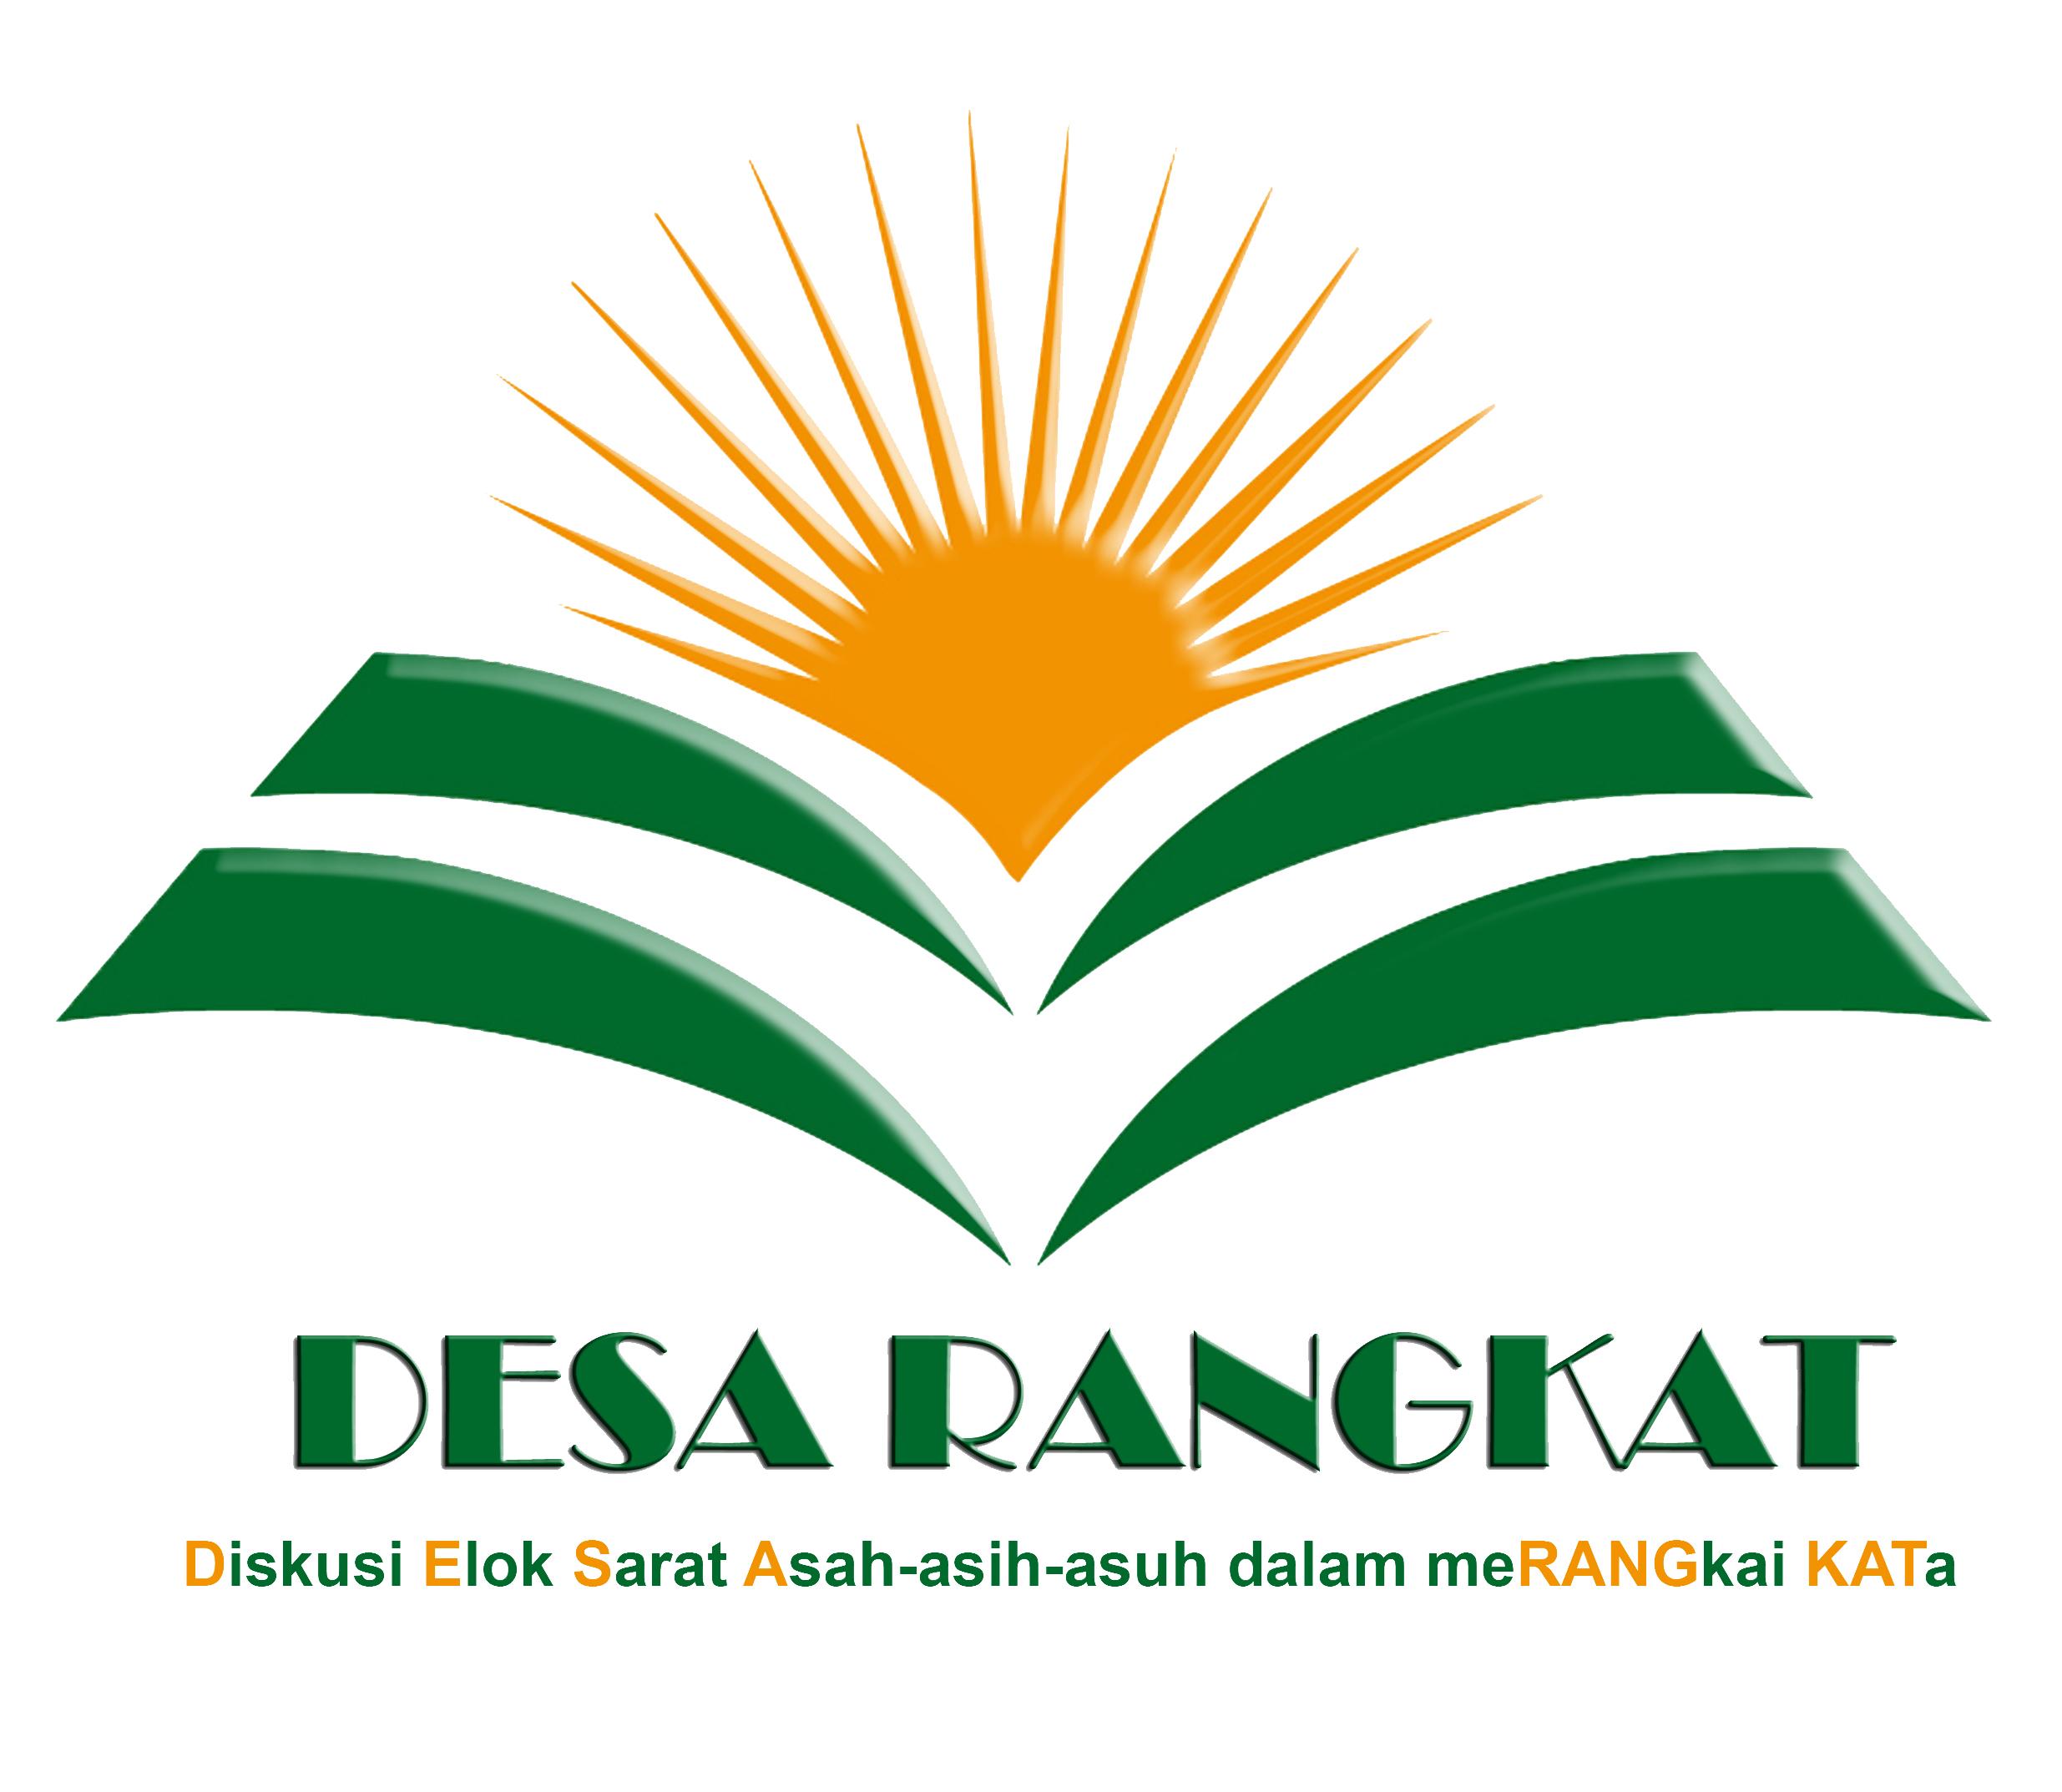 items/kaleidoskop_2019/1-desa-rangkat-1577687321.jpg